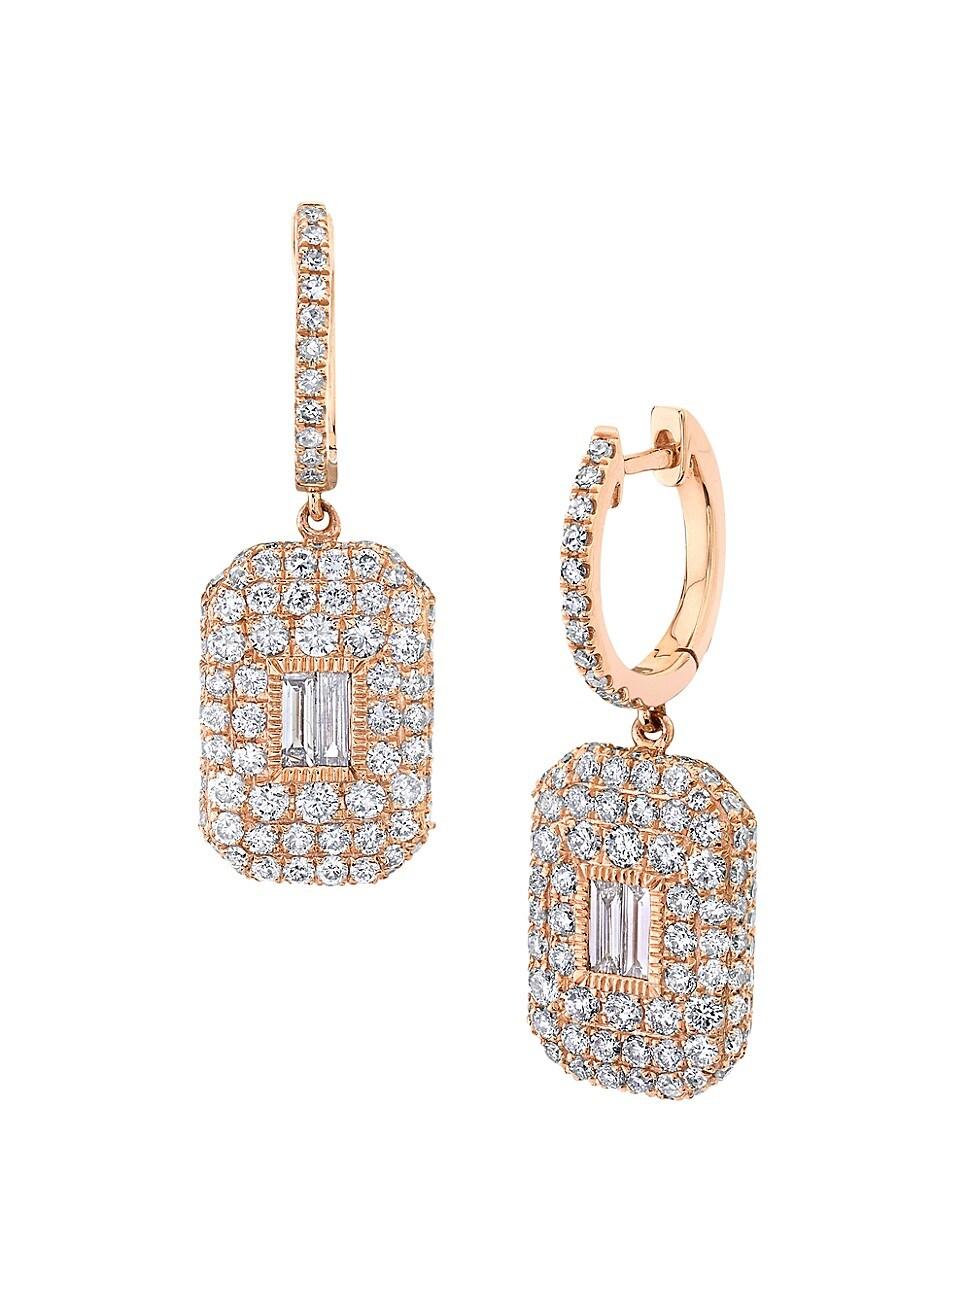 Shay WOMEN'S NEW MODERN 18K ROSE GOLD & DIAMOND BAGUETTE DROP EARRINGS